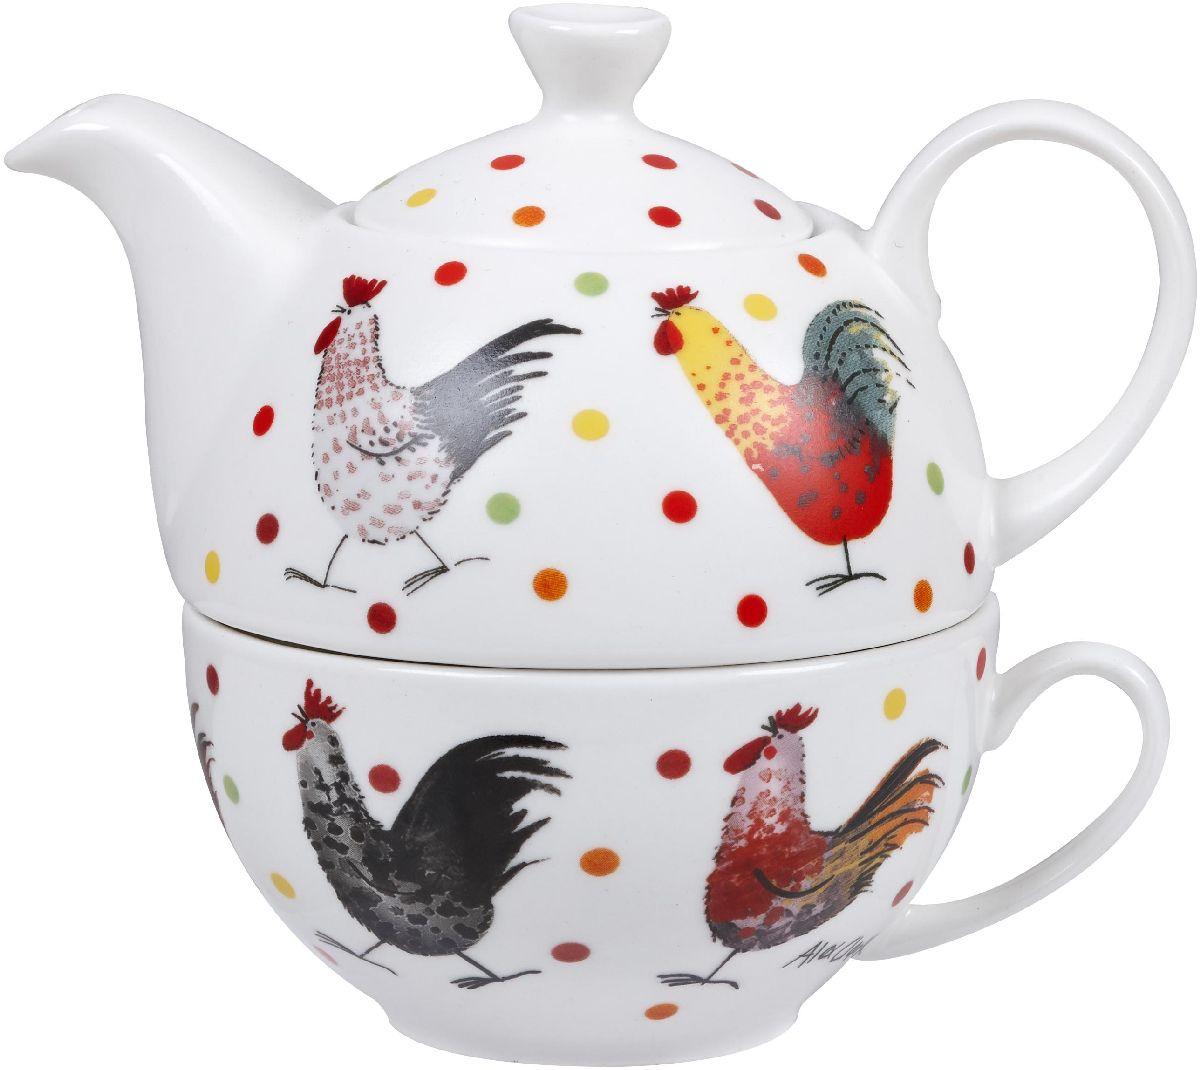 Набор чайный Churchill Петухи, 2 предмета. ACRS00491 dorothy s нome плейсмат набор 4шт принт петухи пвх